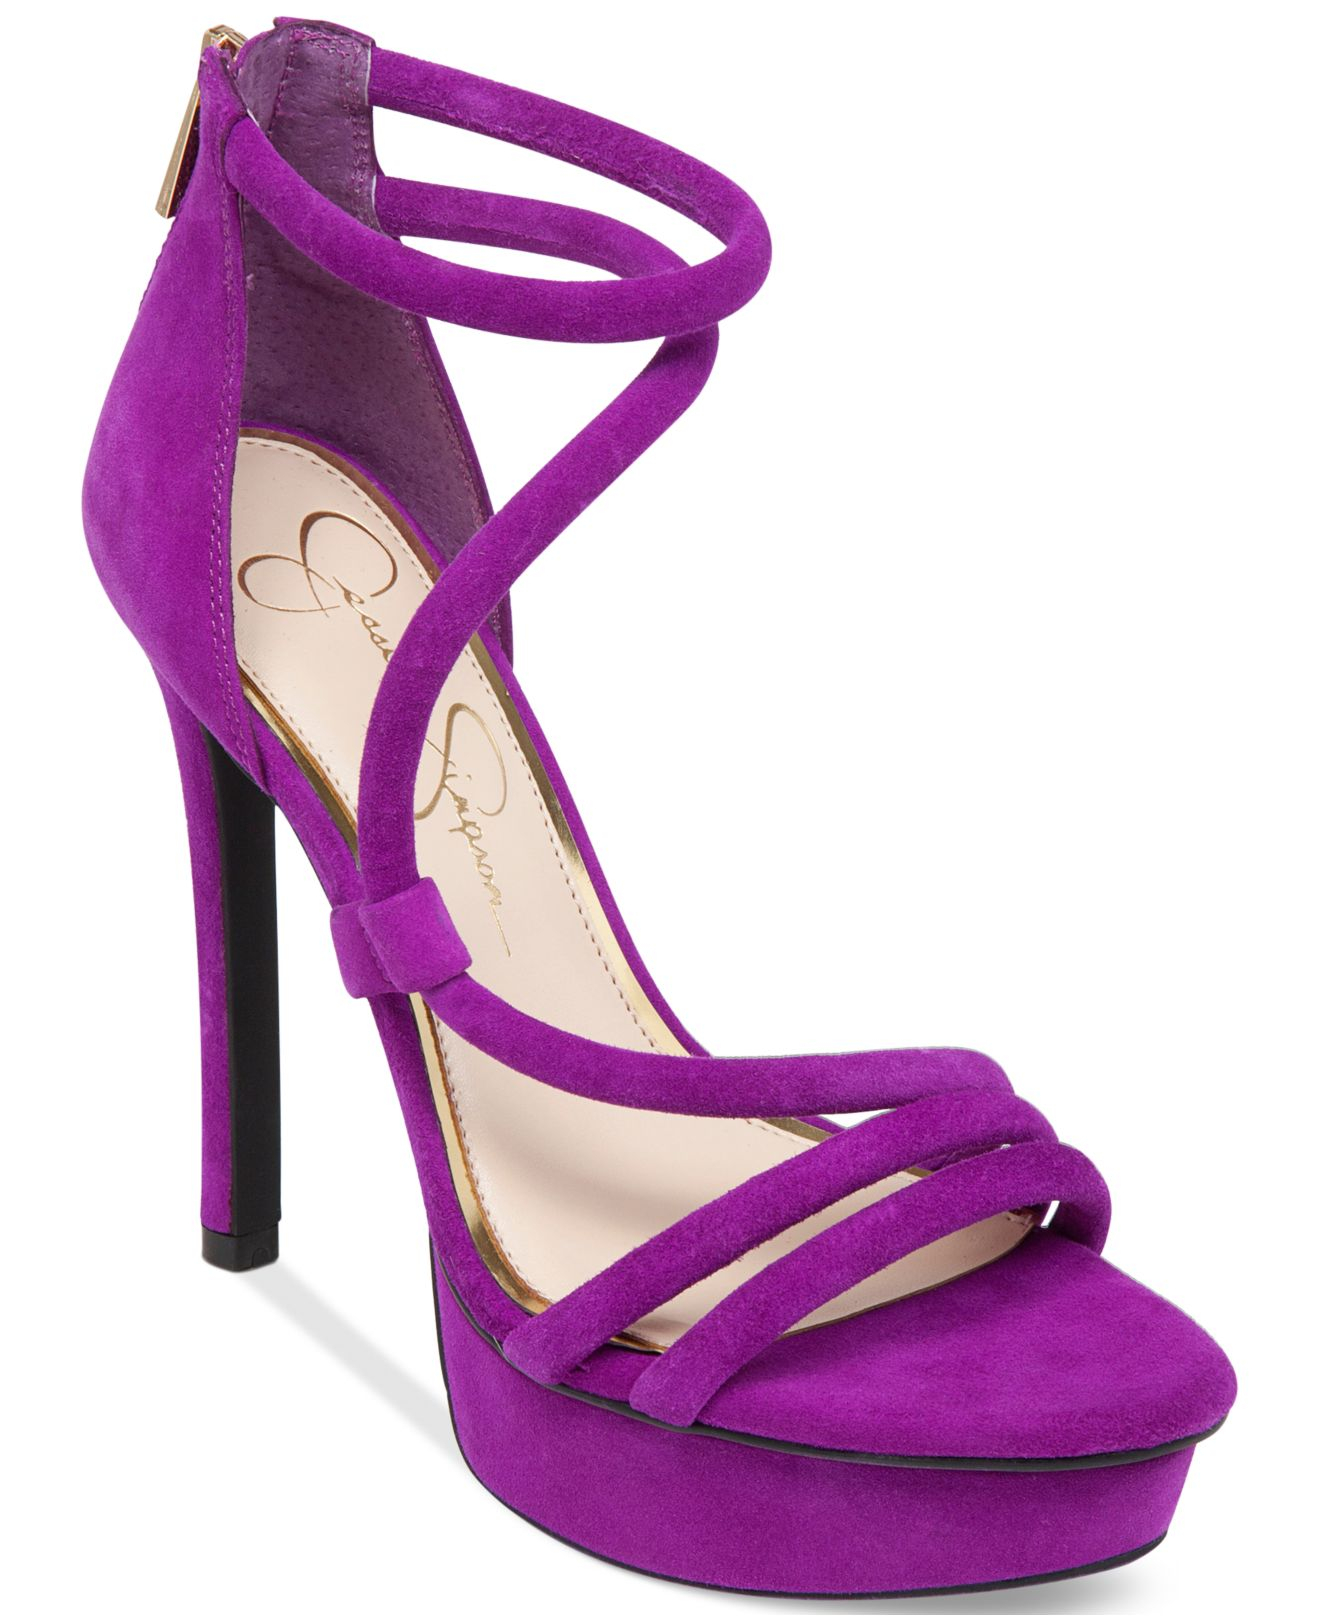 Jessica simpson Caela Asymmetrical Platform Dress Sandals in ...